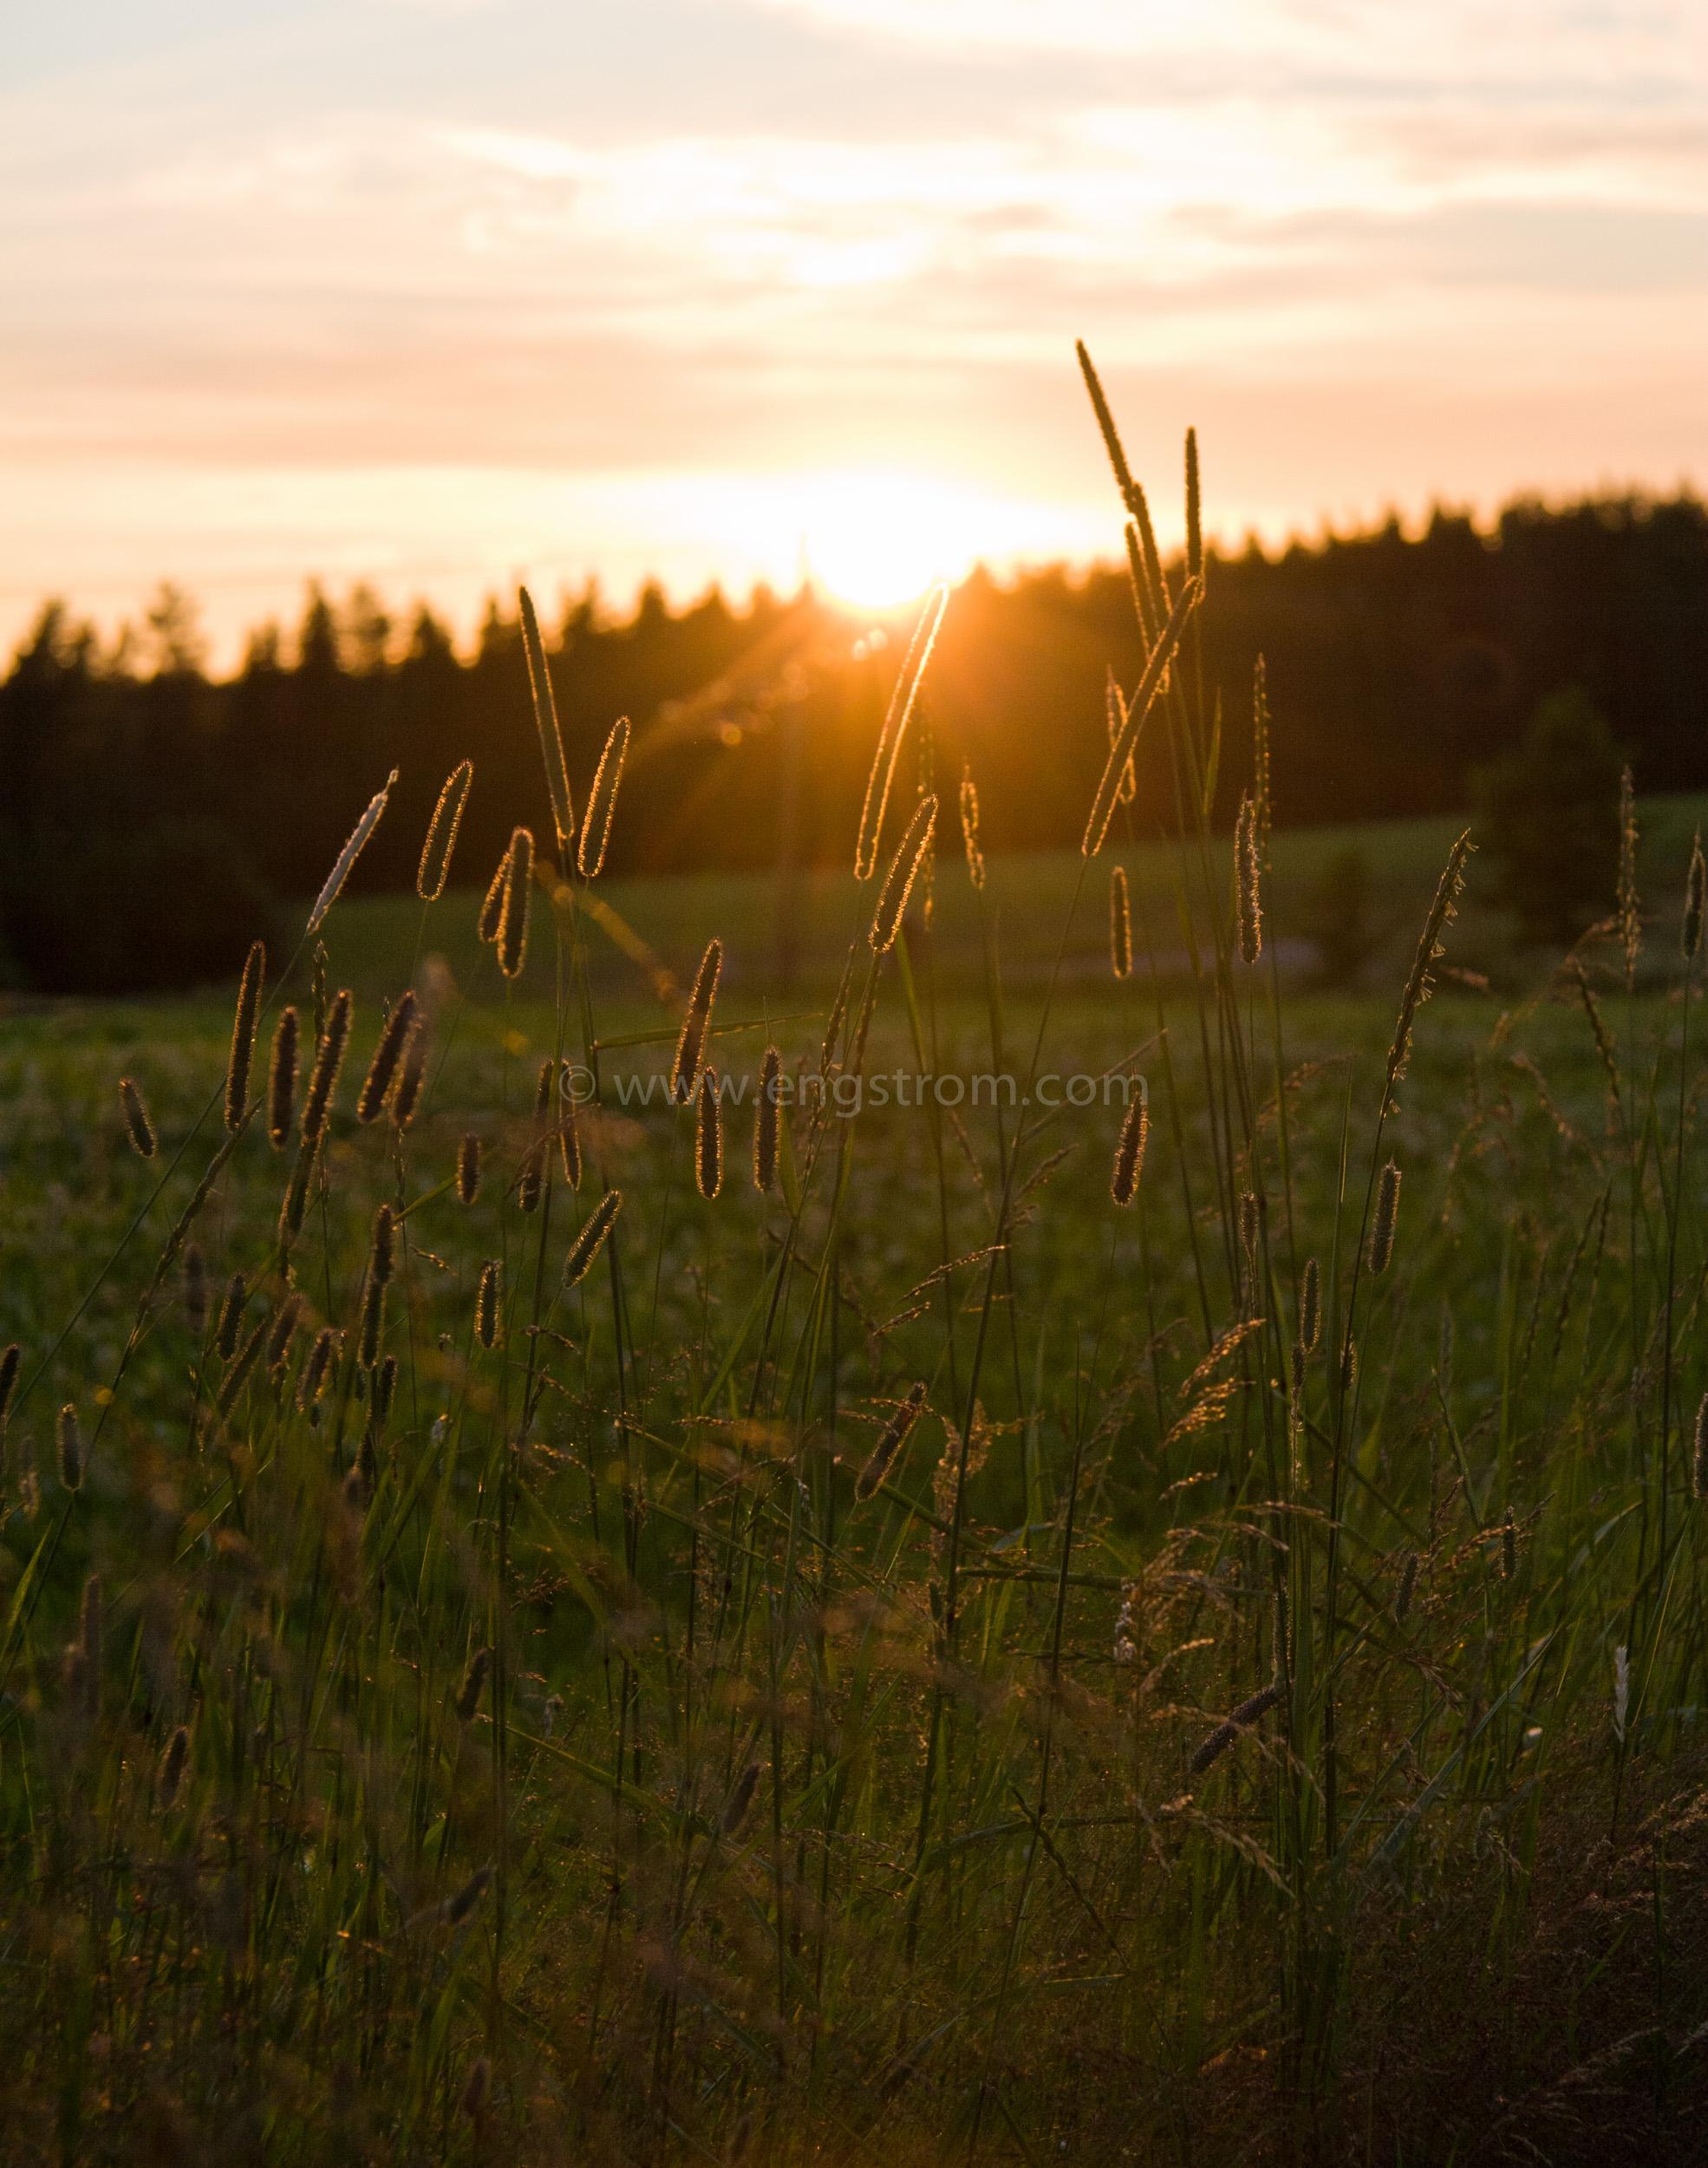 JE_11501, Solnedgång på sommaren, Jonas Engström